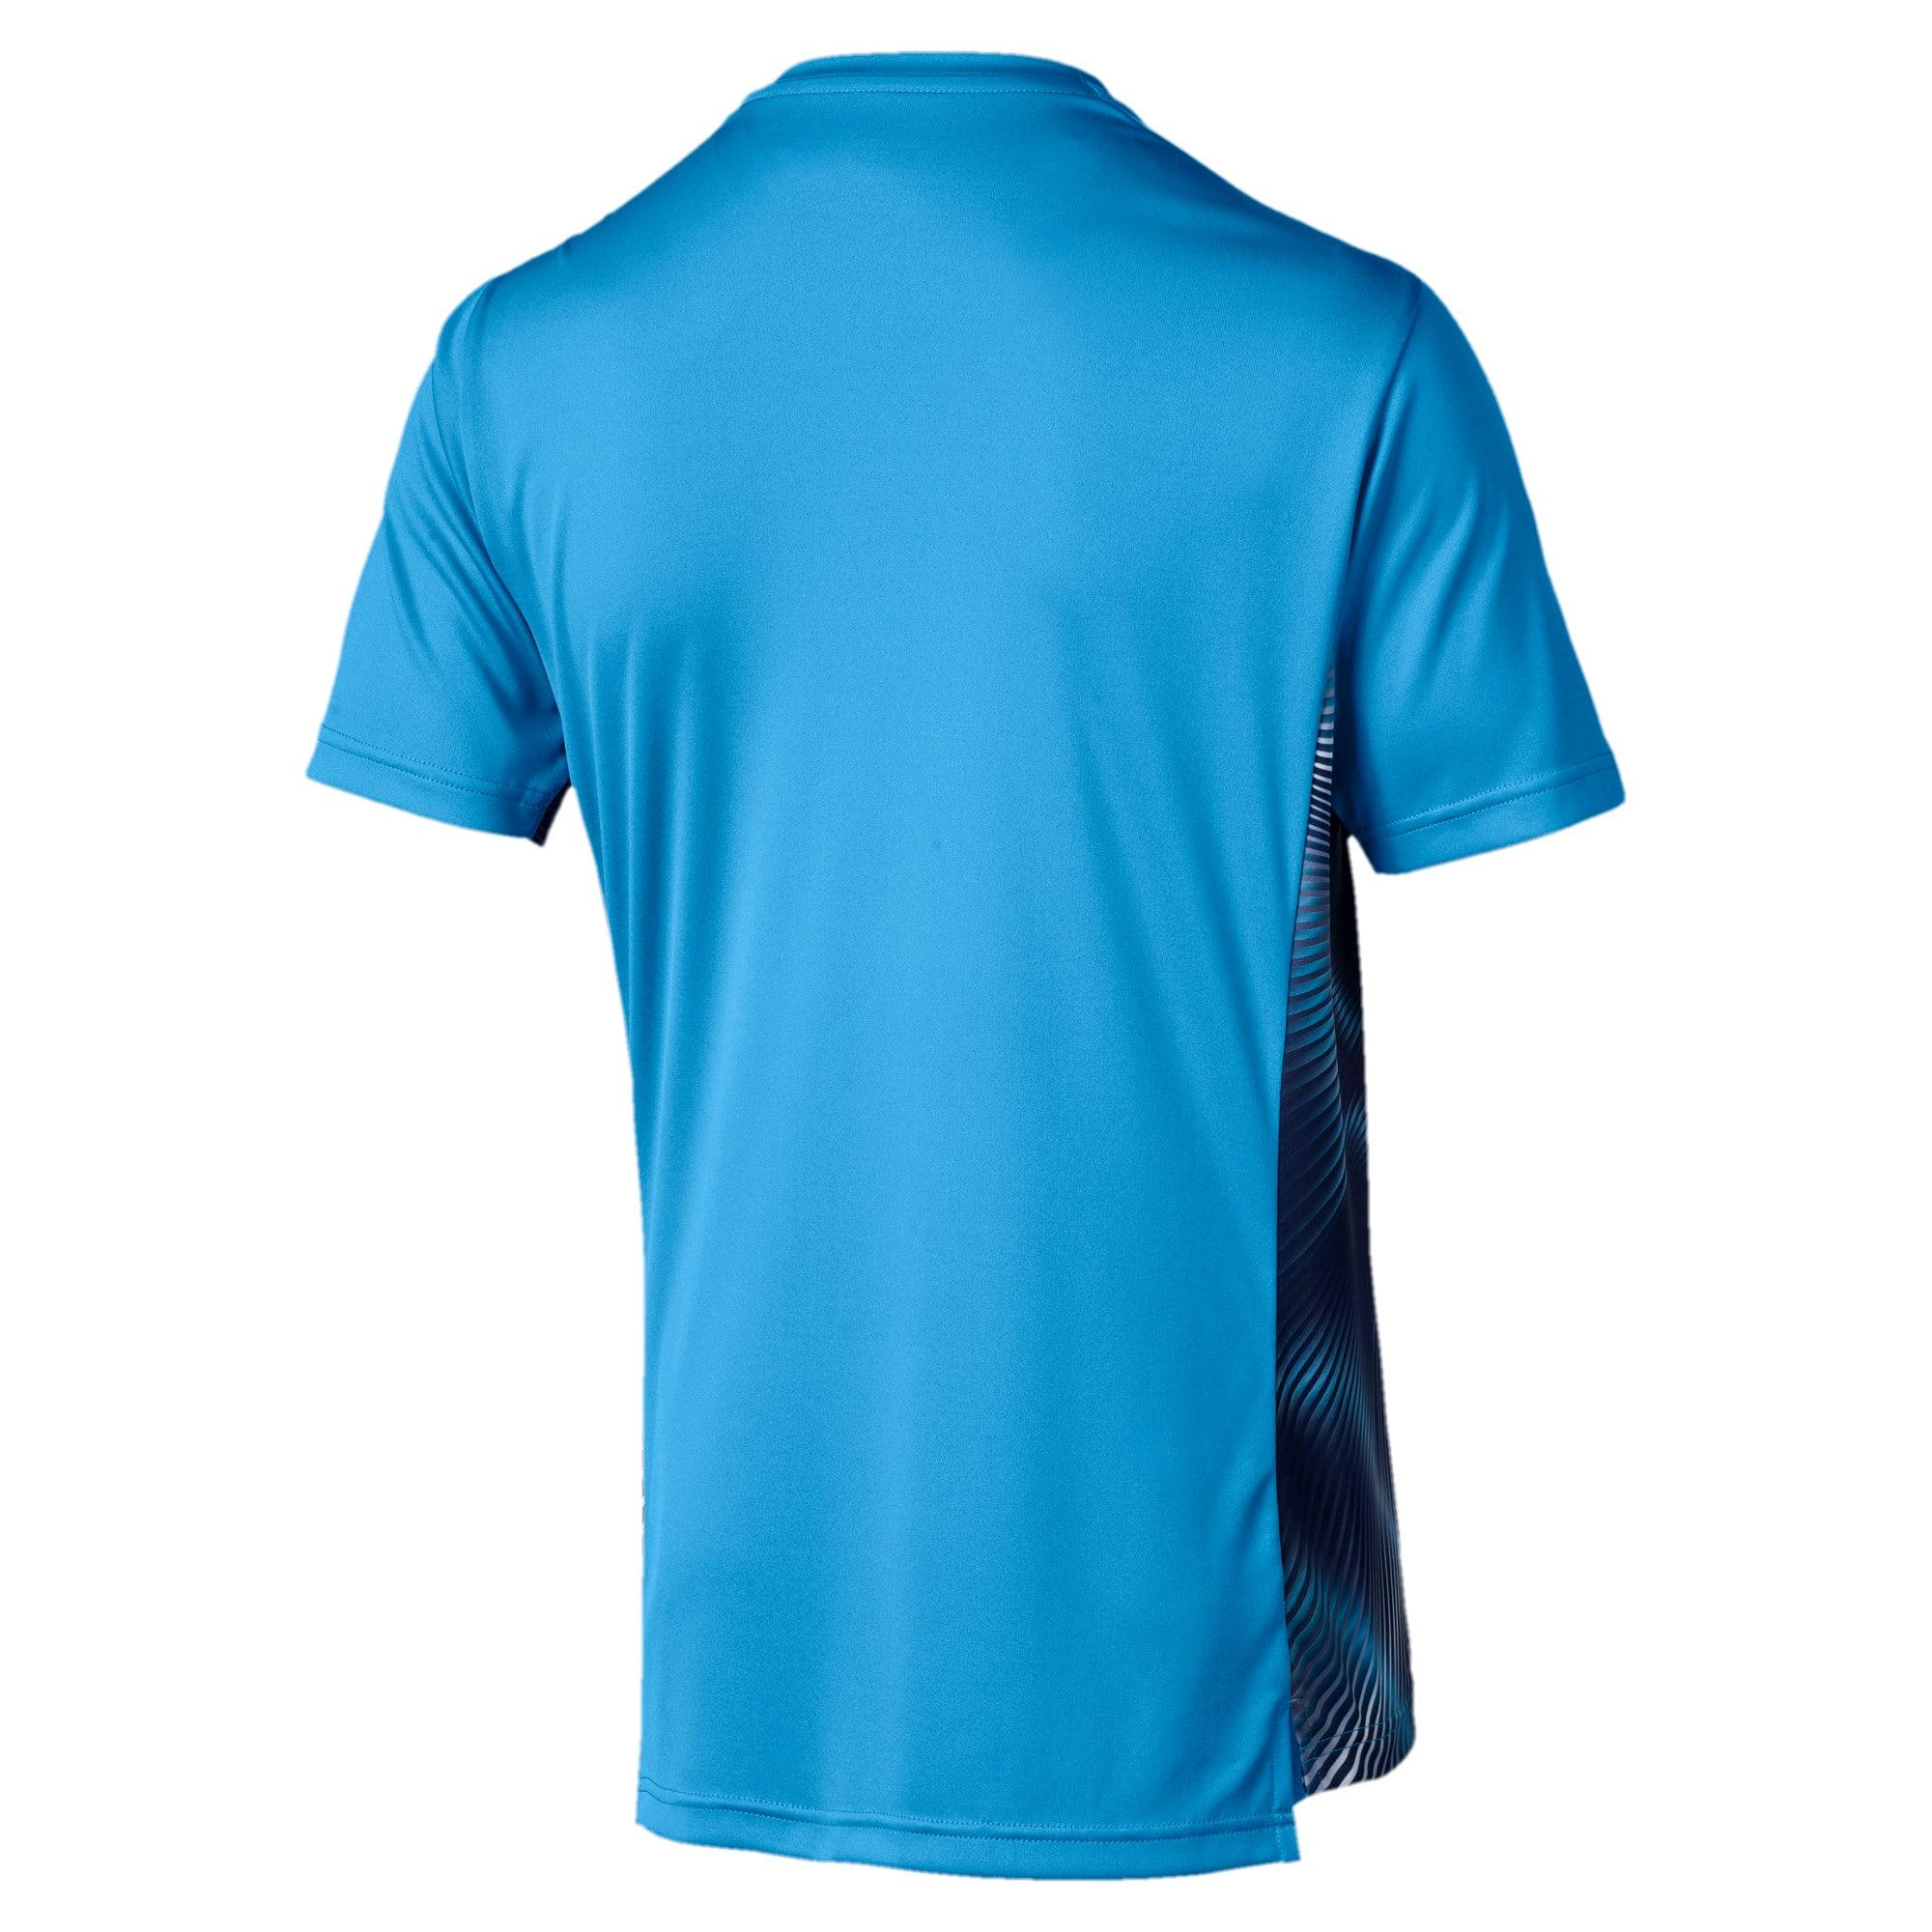 Thumbnail 2 van Valencia CF stadionshirt voor mannen, Bleu Azur-Peacoat, medium